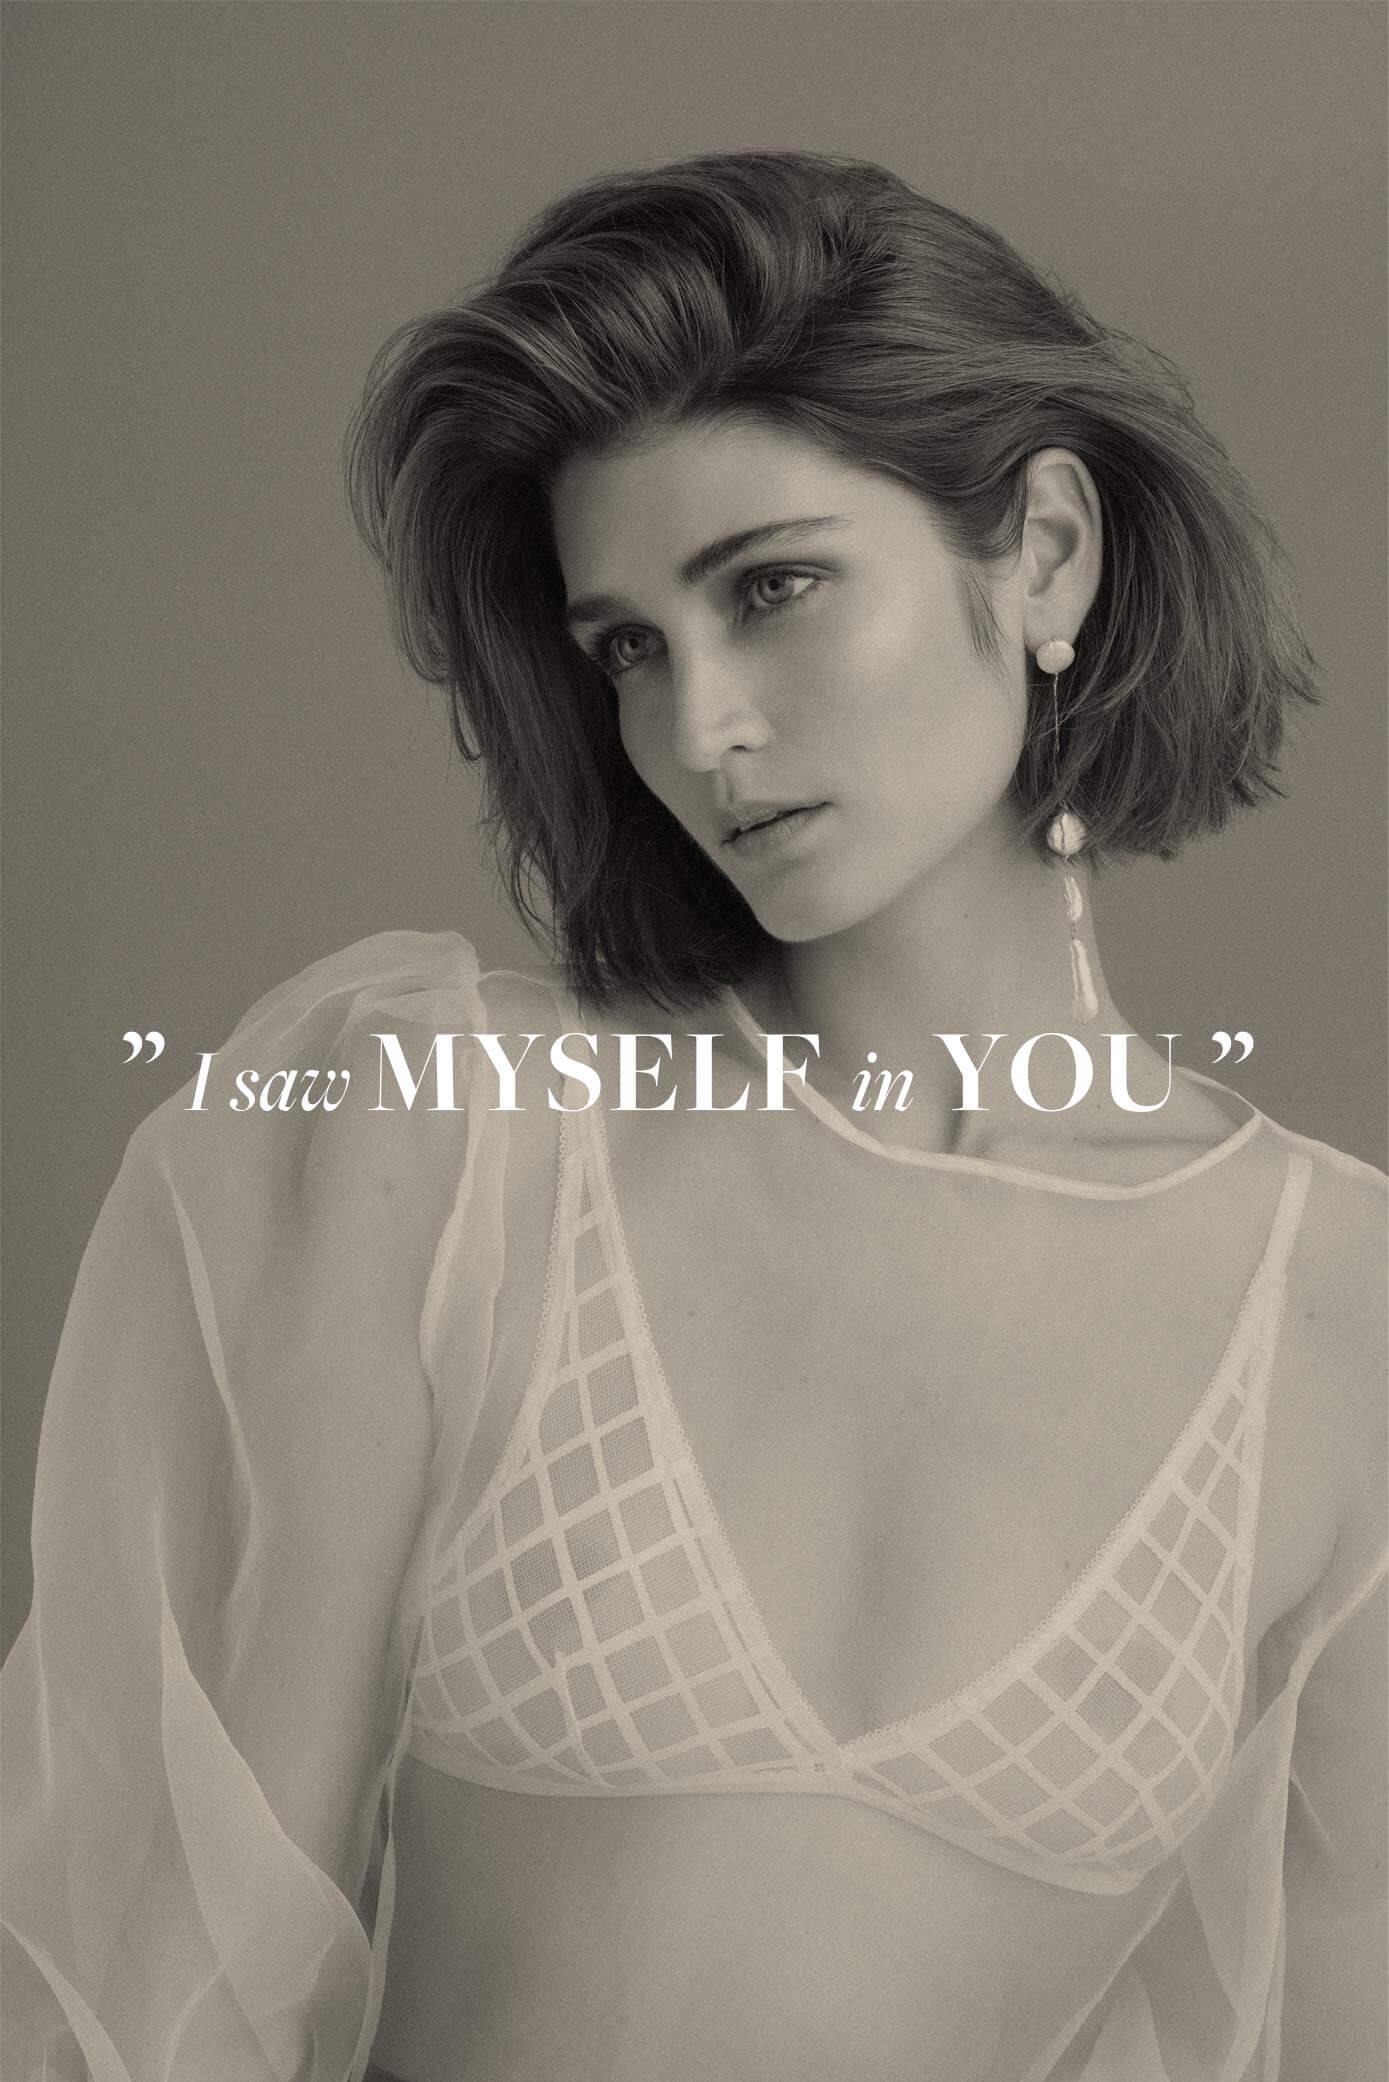 I saw myself in you